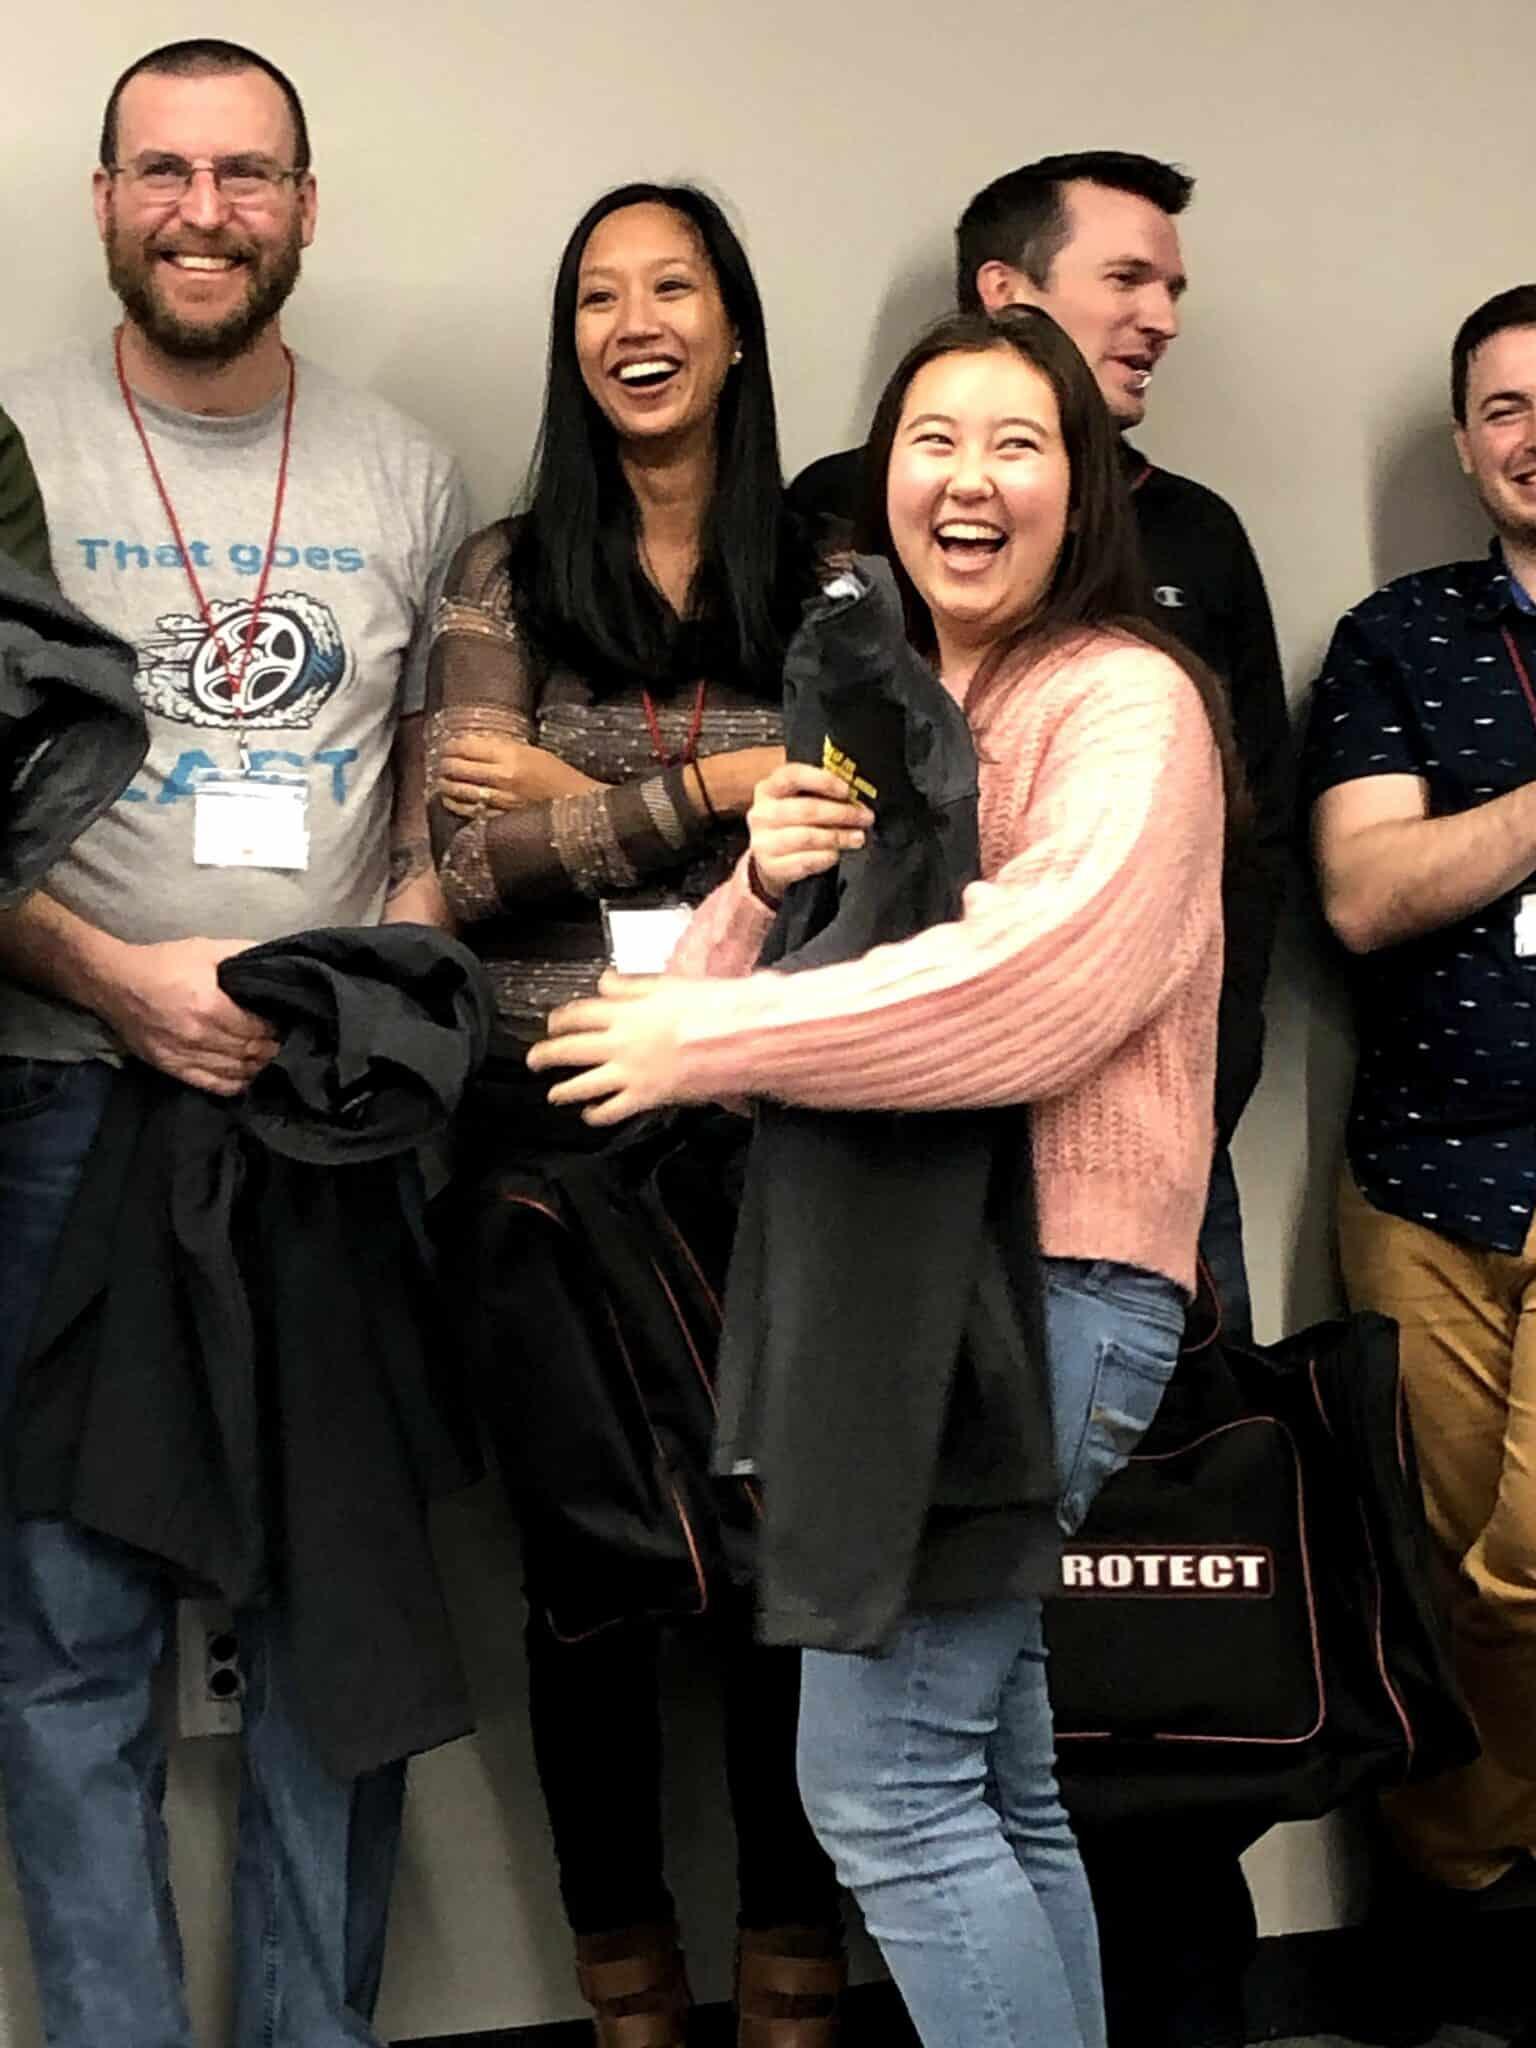 NER Celebrates 2019 at Annual Meeting